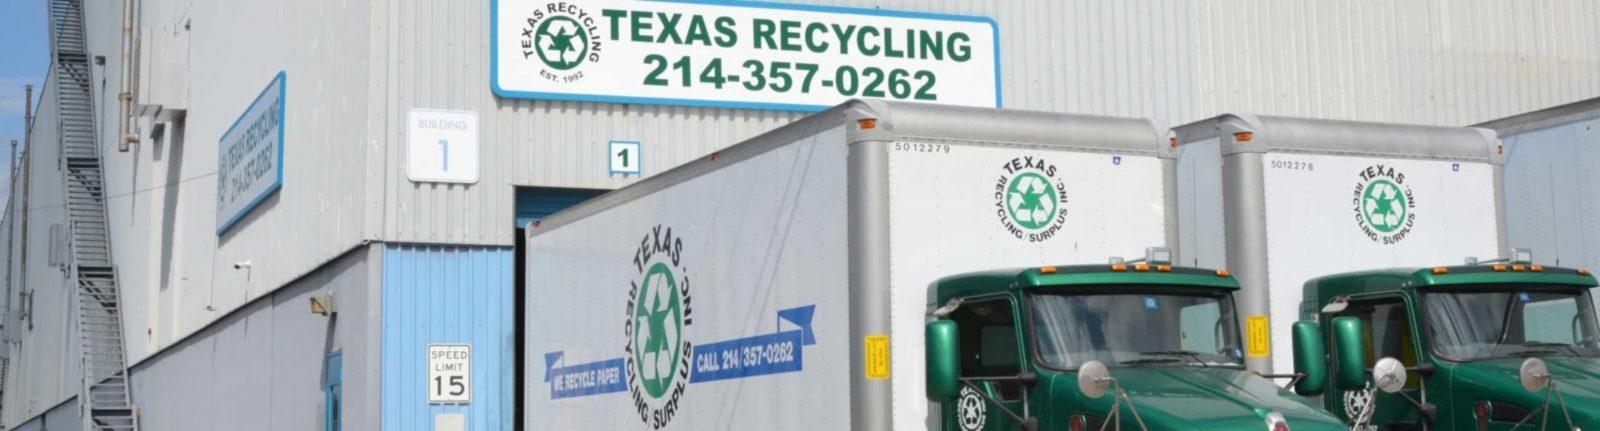 Metal-Recycling-Dallas_TxR-Slider-Trucks